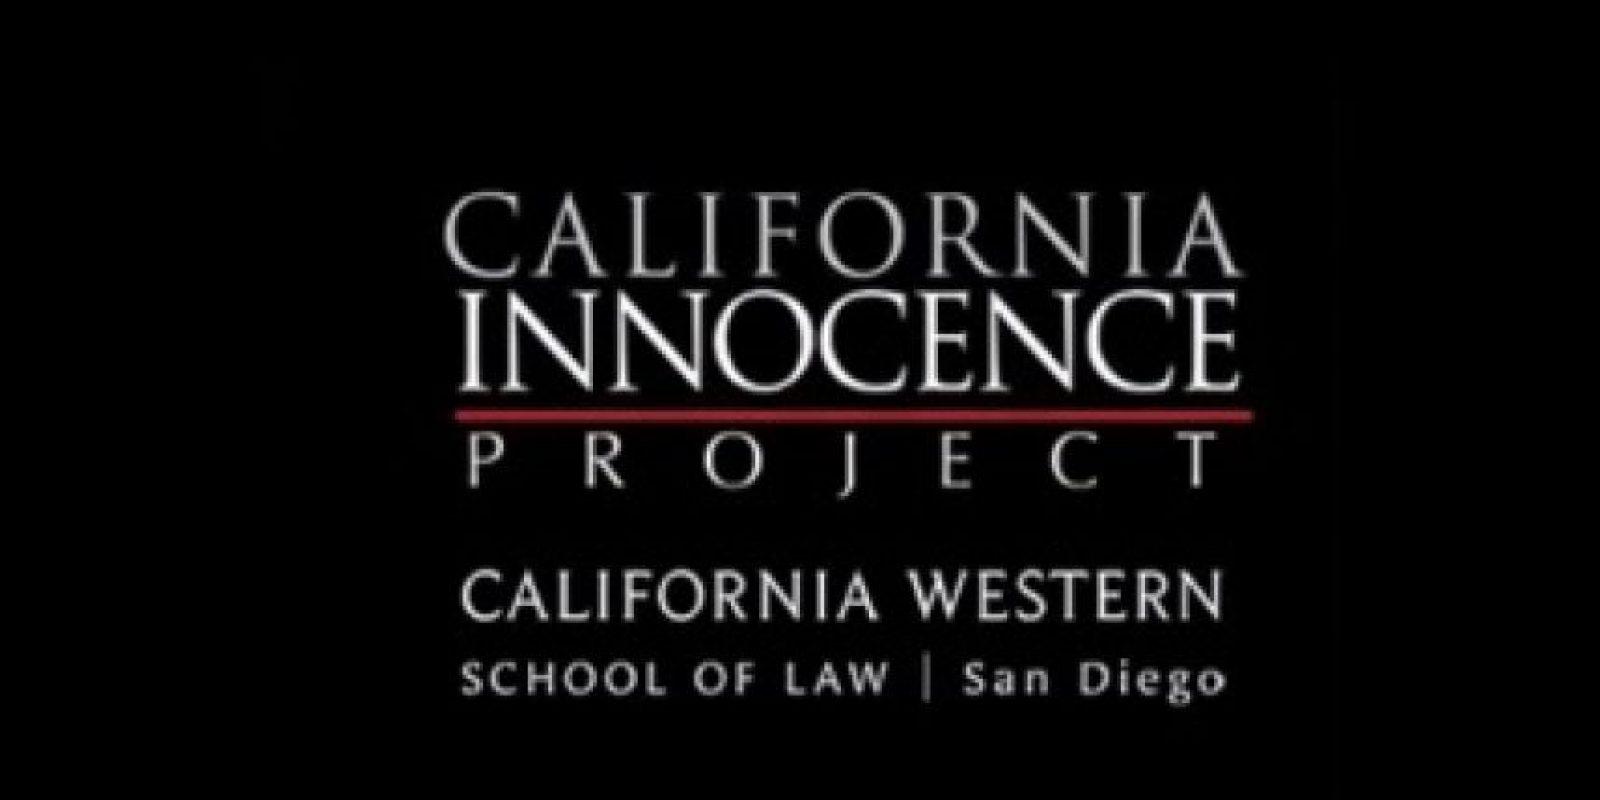 Foto:Vía Youtube/California Innocence Project